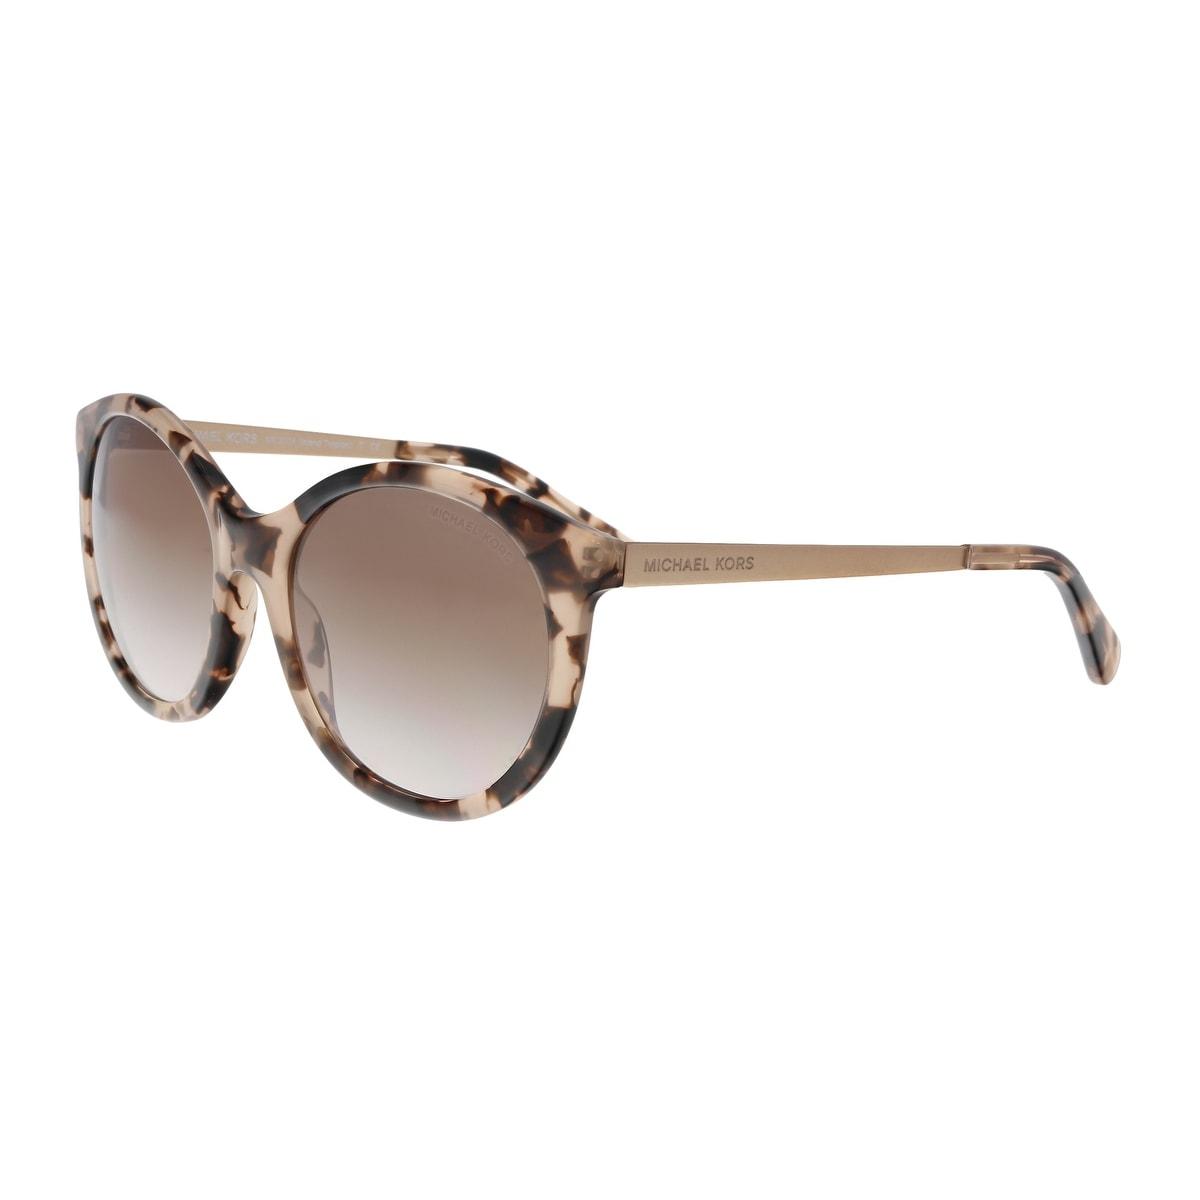 2c9cef66e27 Michael Kors Sunglasses